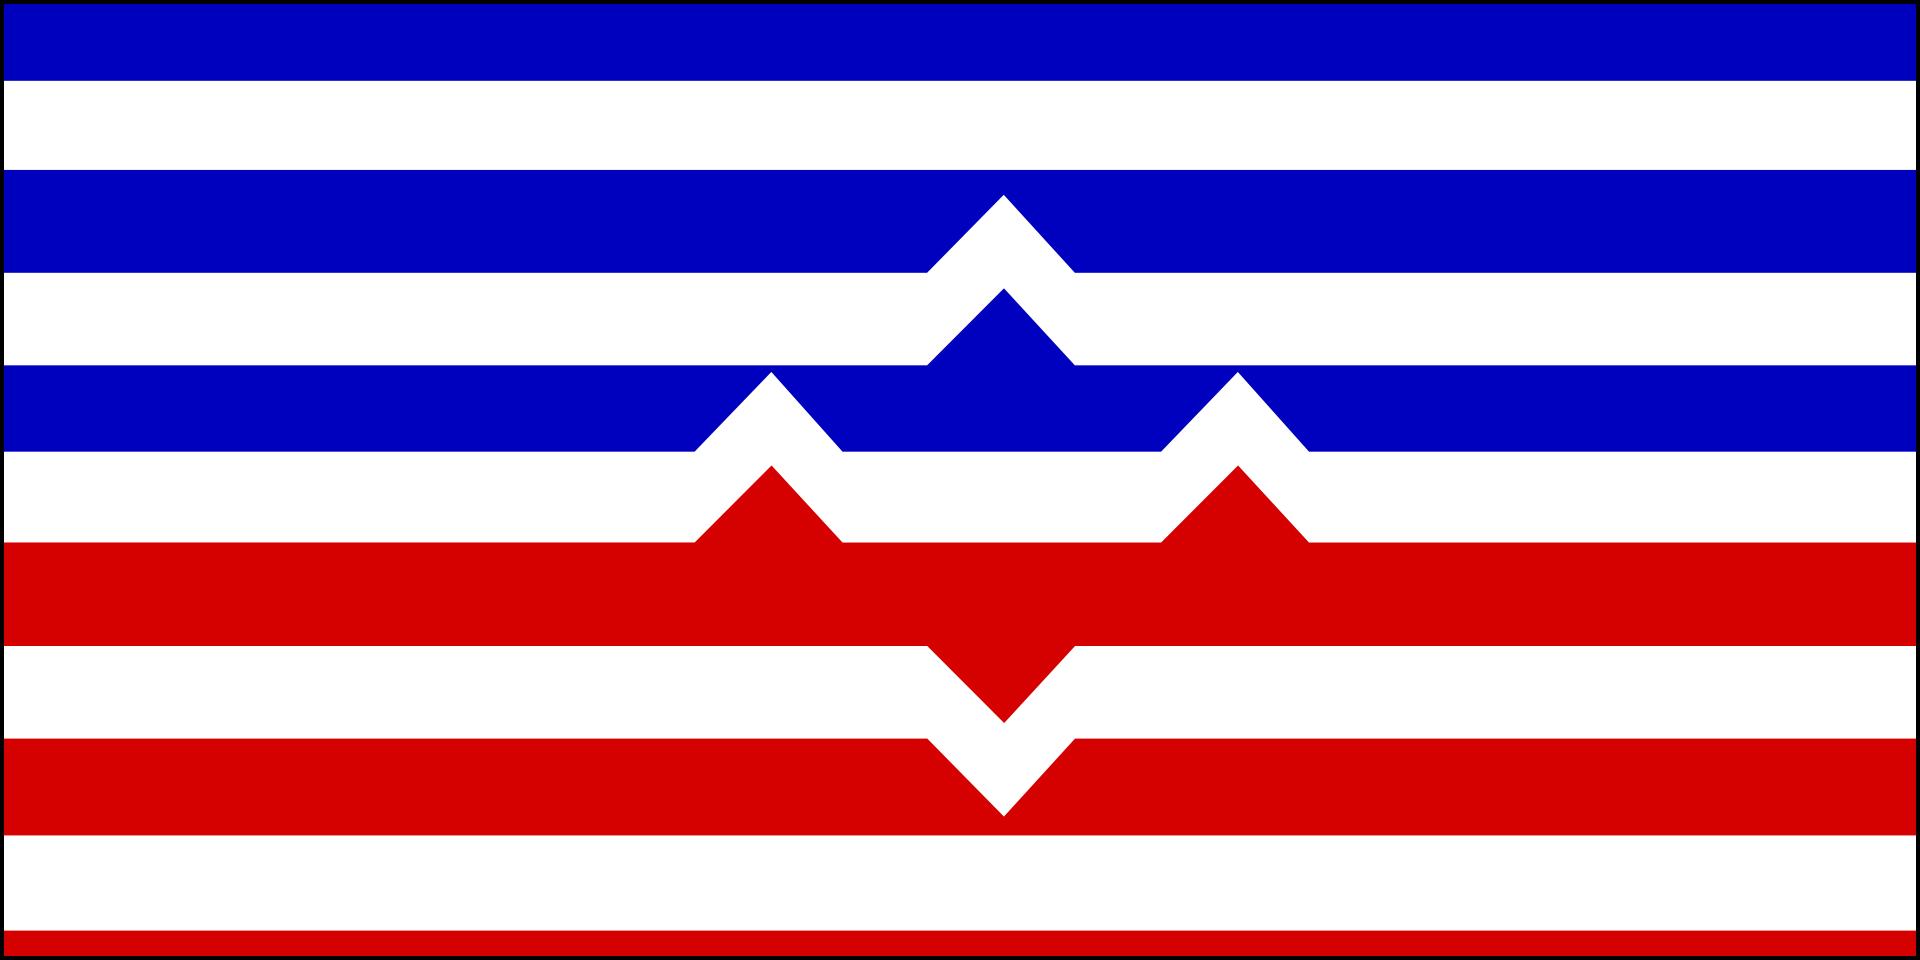 Ontwerp nieuwe vlag Slovenië